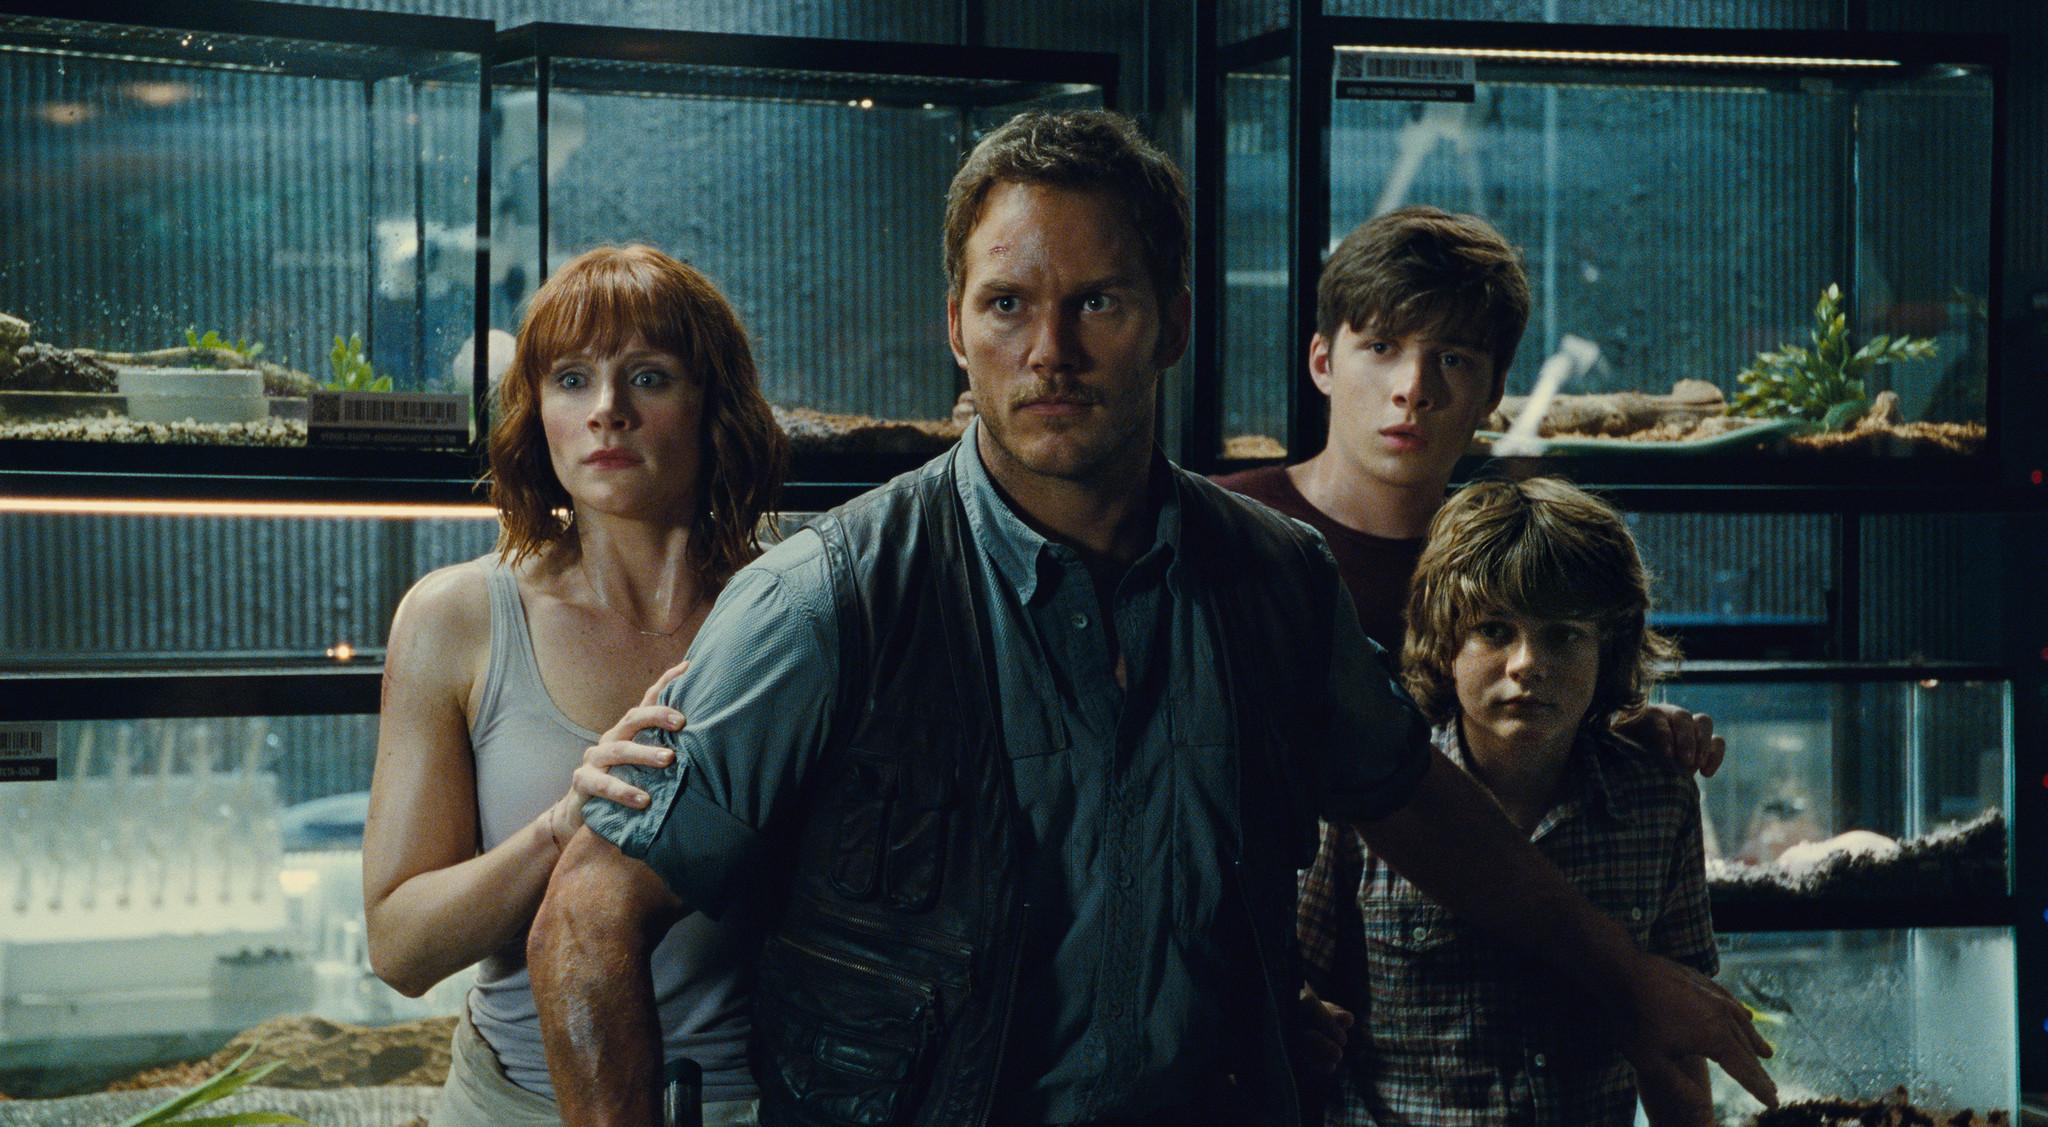 Bryce Dallas Howard, Chris Pratt, Ty Simpkins, and Nick Robinson in Jurassic World (2015)